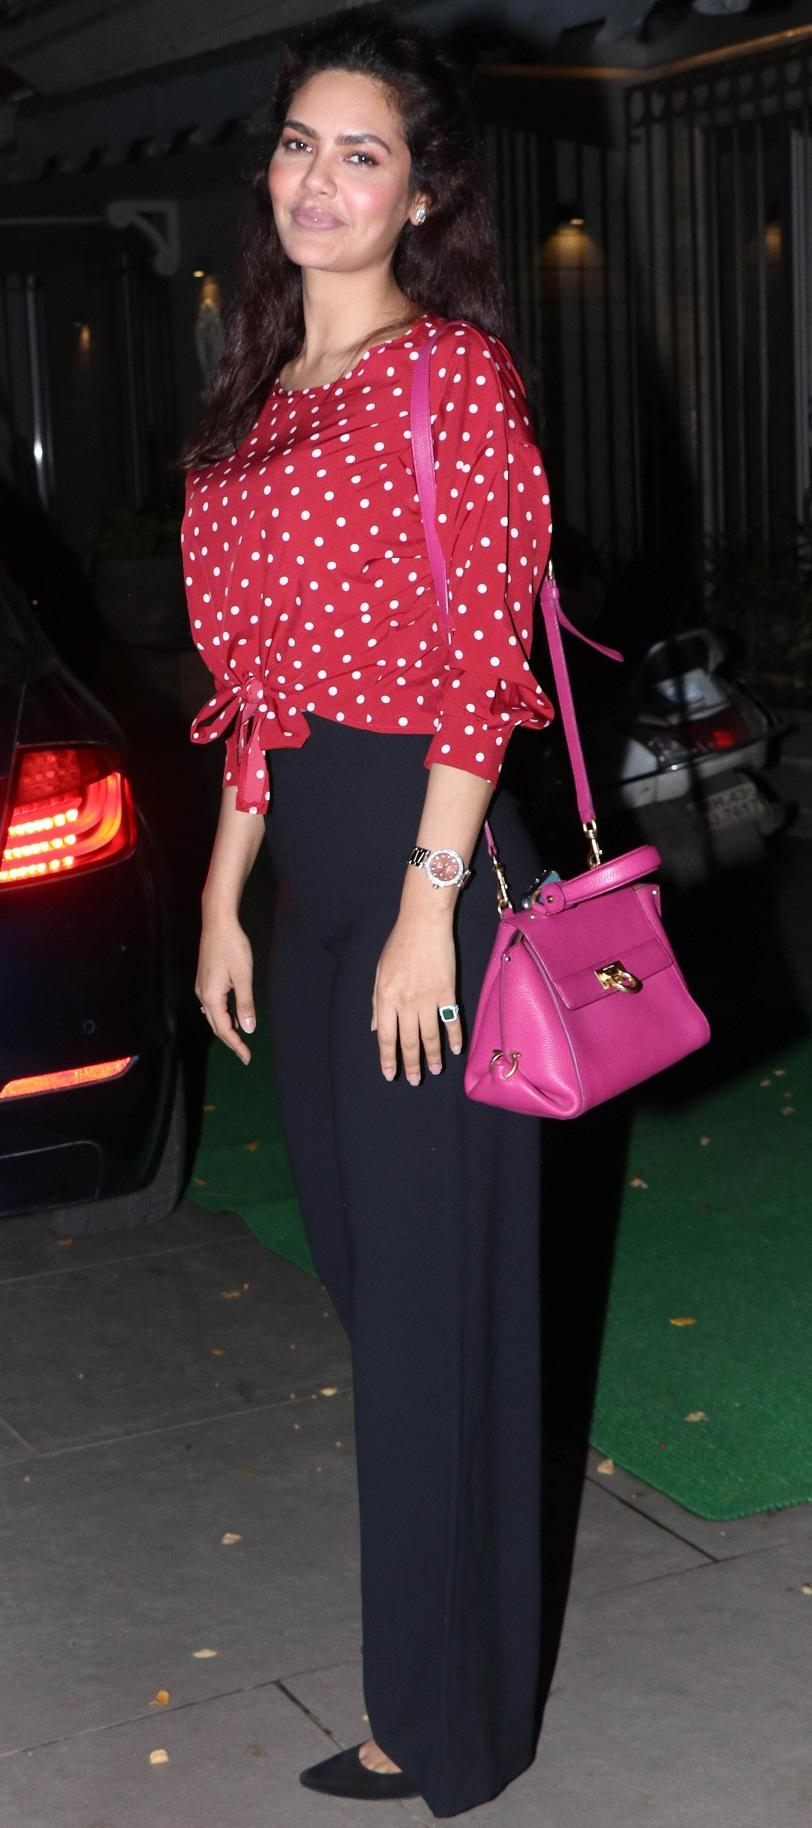 Bollywood Tadka, ईशा गुप्ता फोटो गैलरी, Esha Gupta Photo Gallery